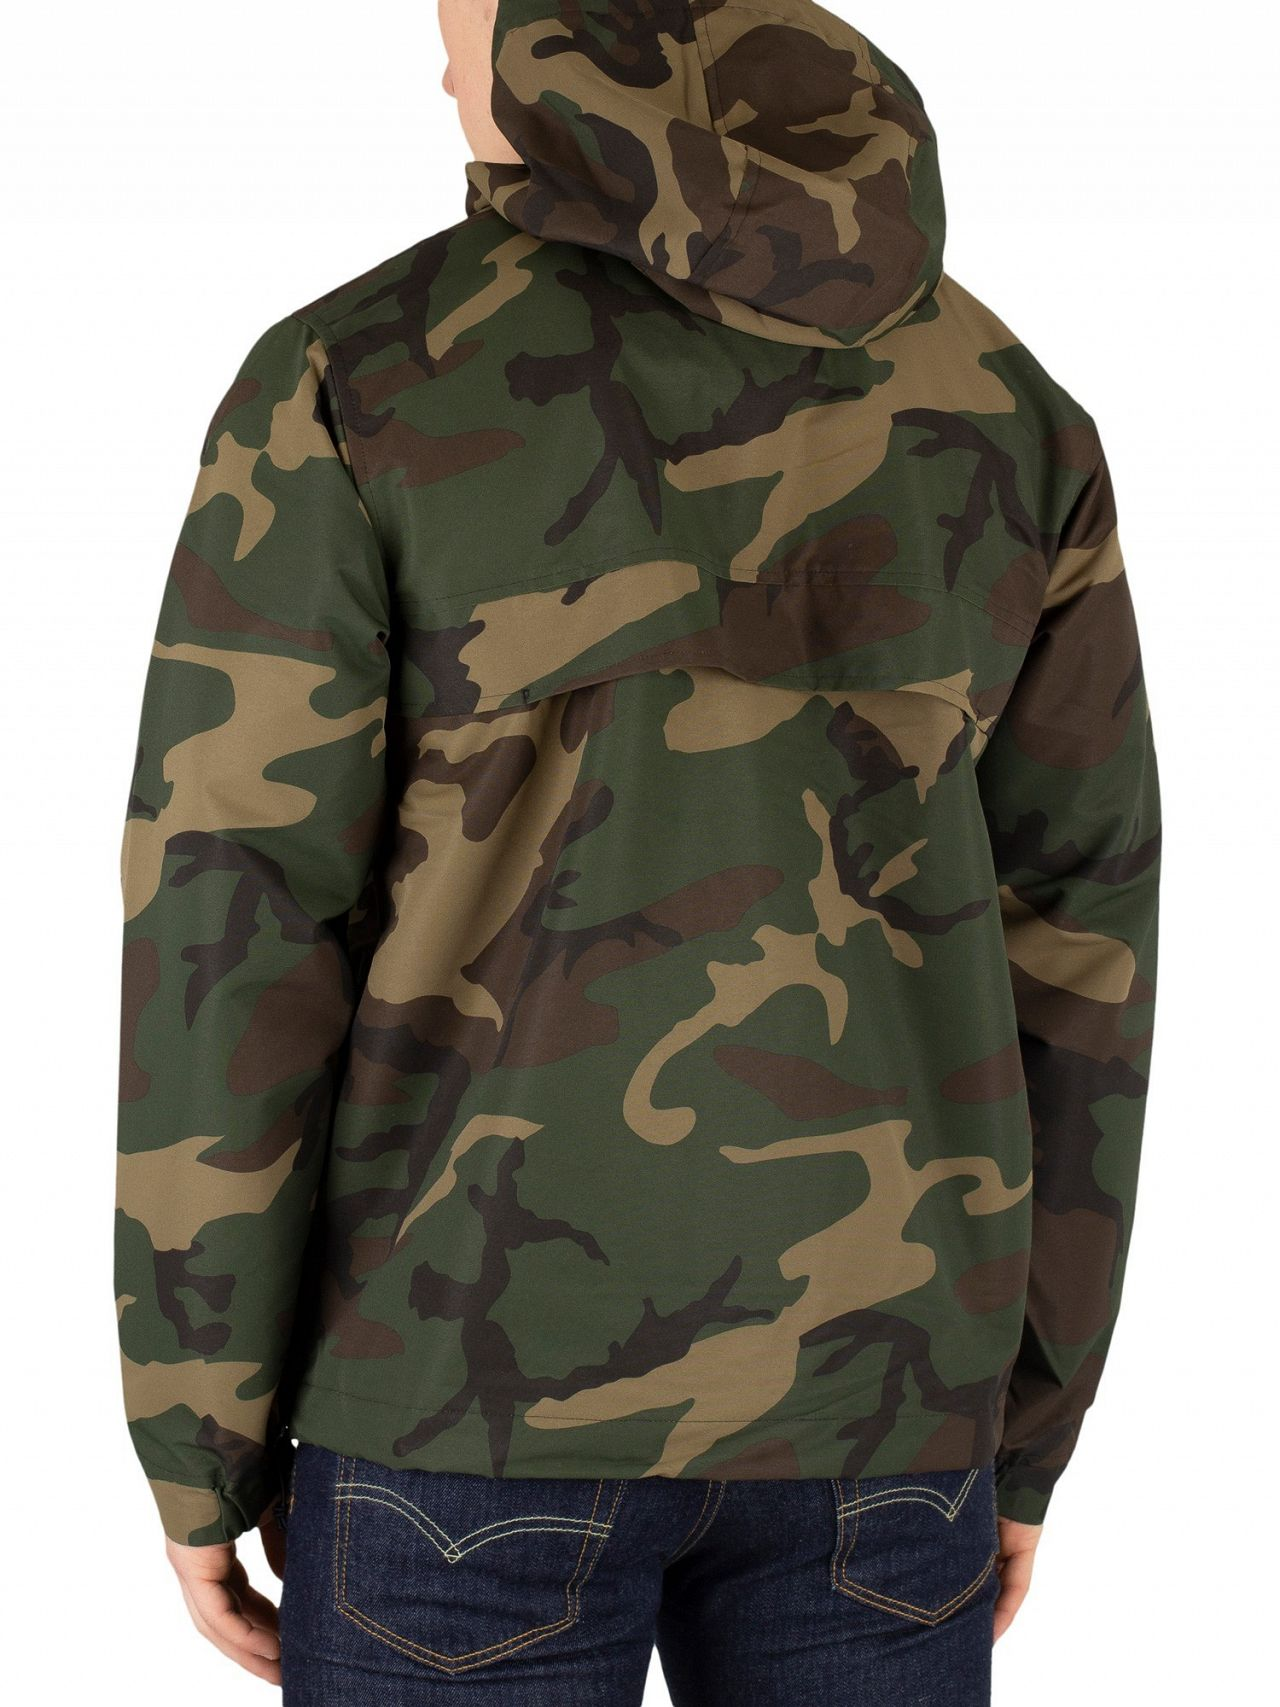 10462a31 Carhartt WIP Camo Laurel Nimbus Pullover Jacket | Standout